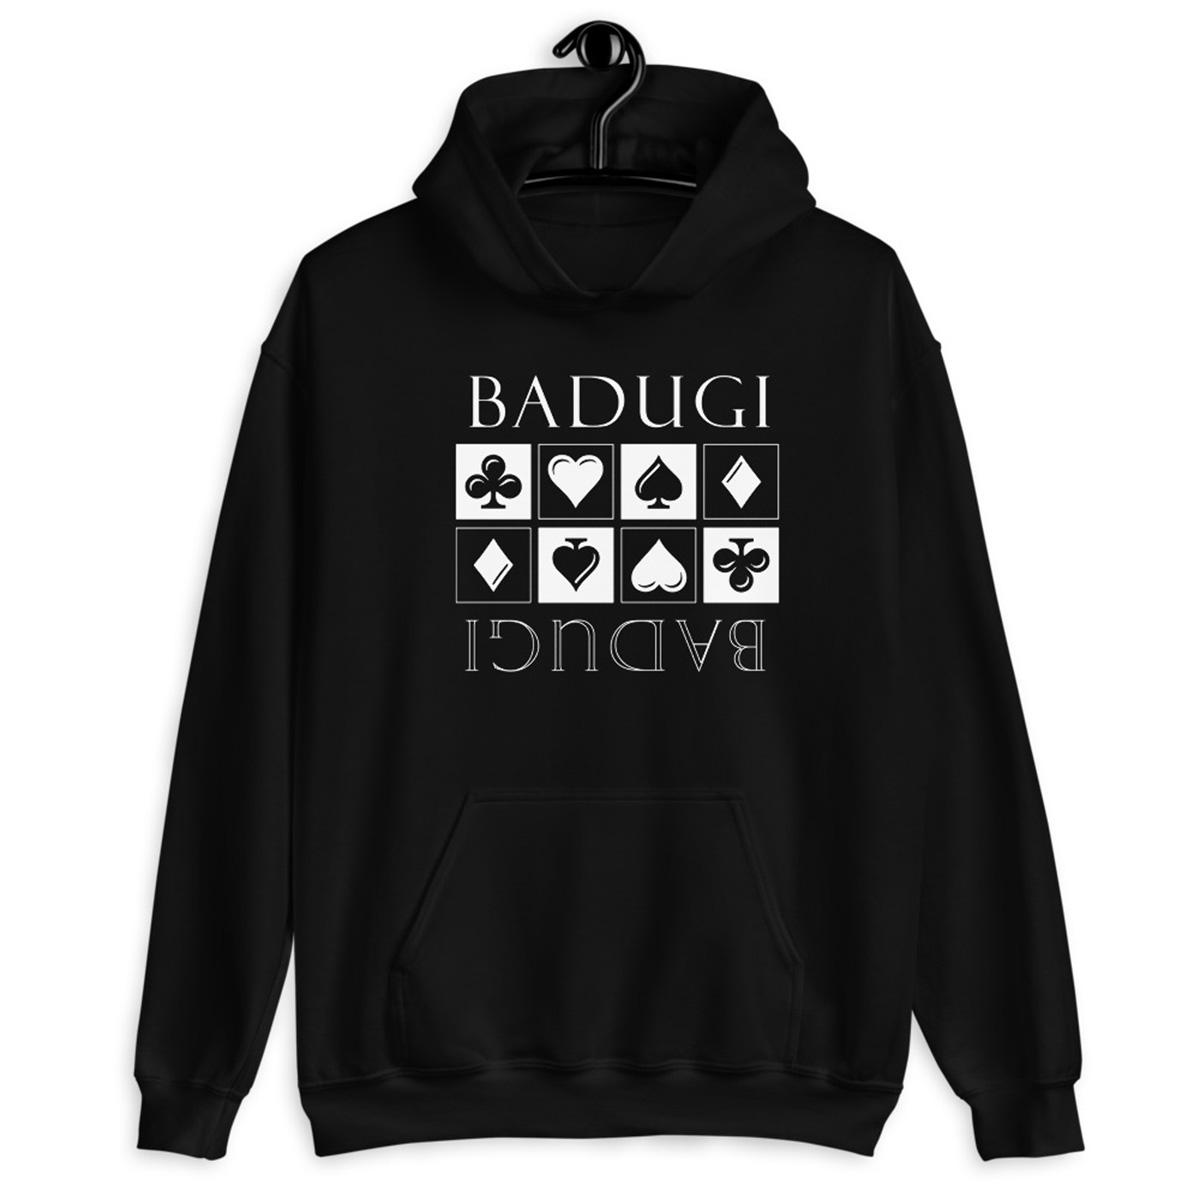 Badugi Hoodie-Indigo Black